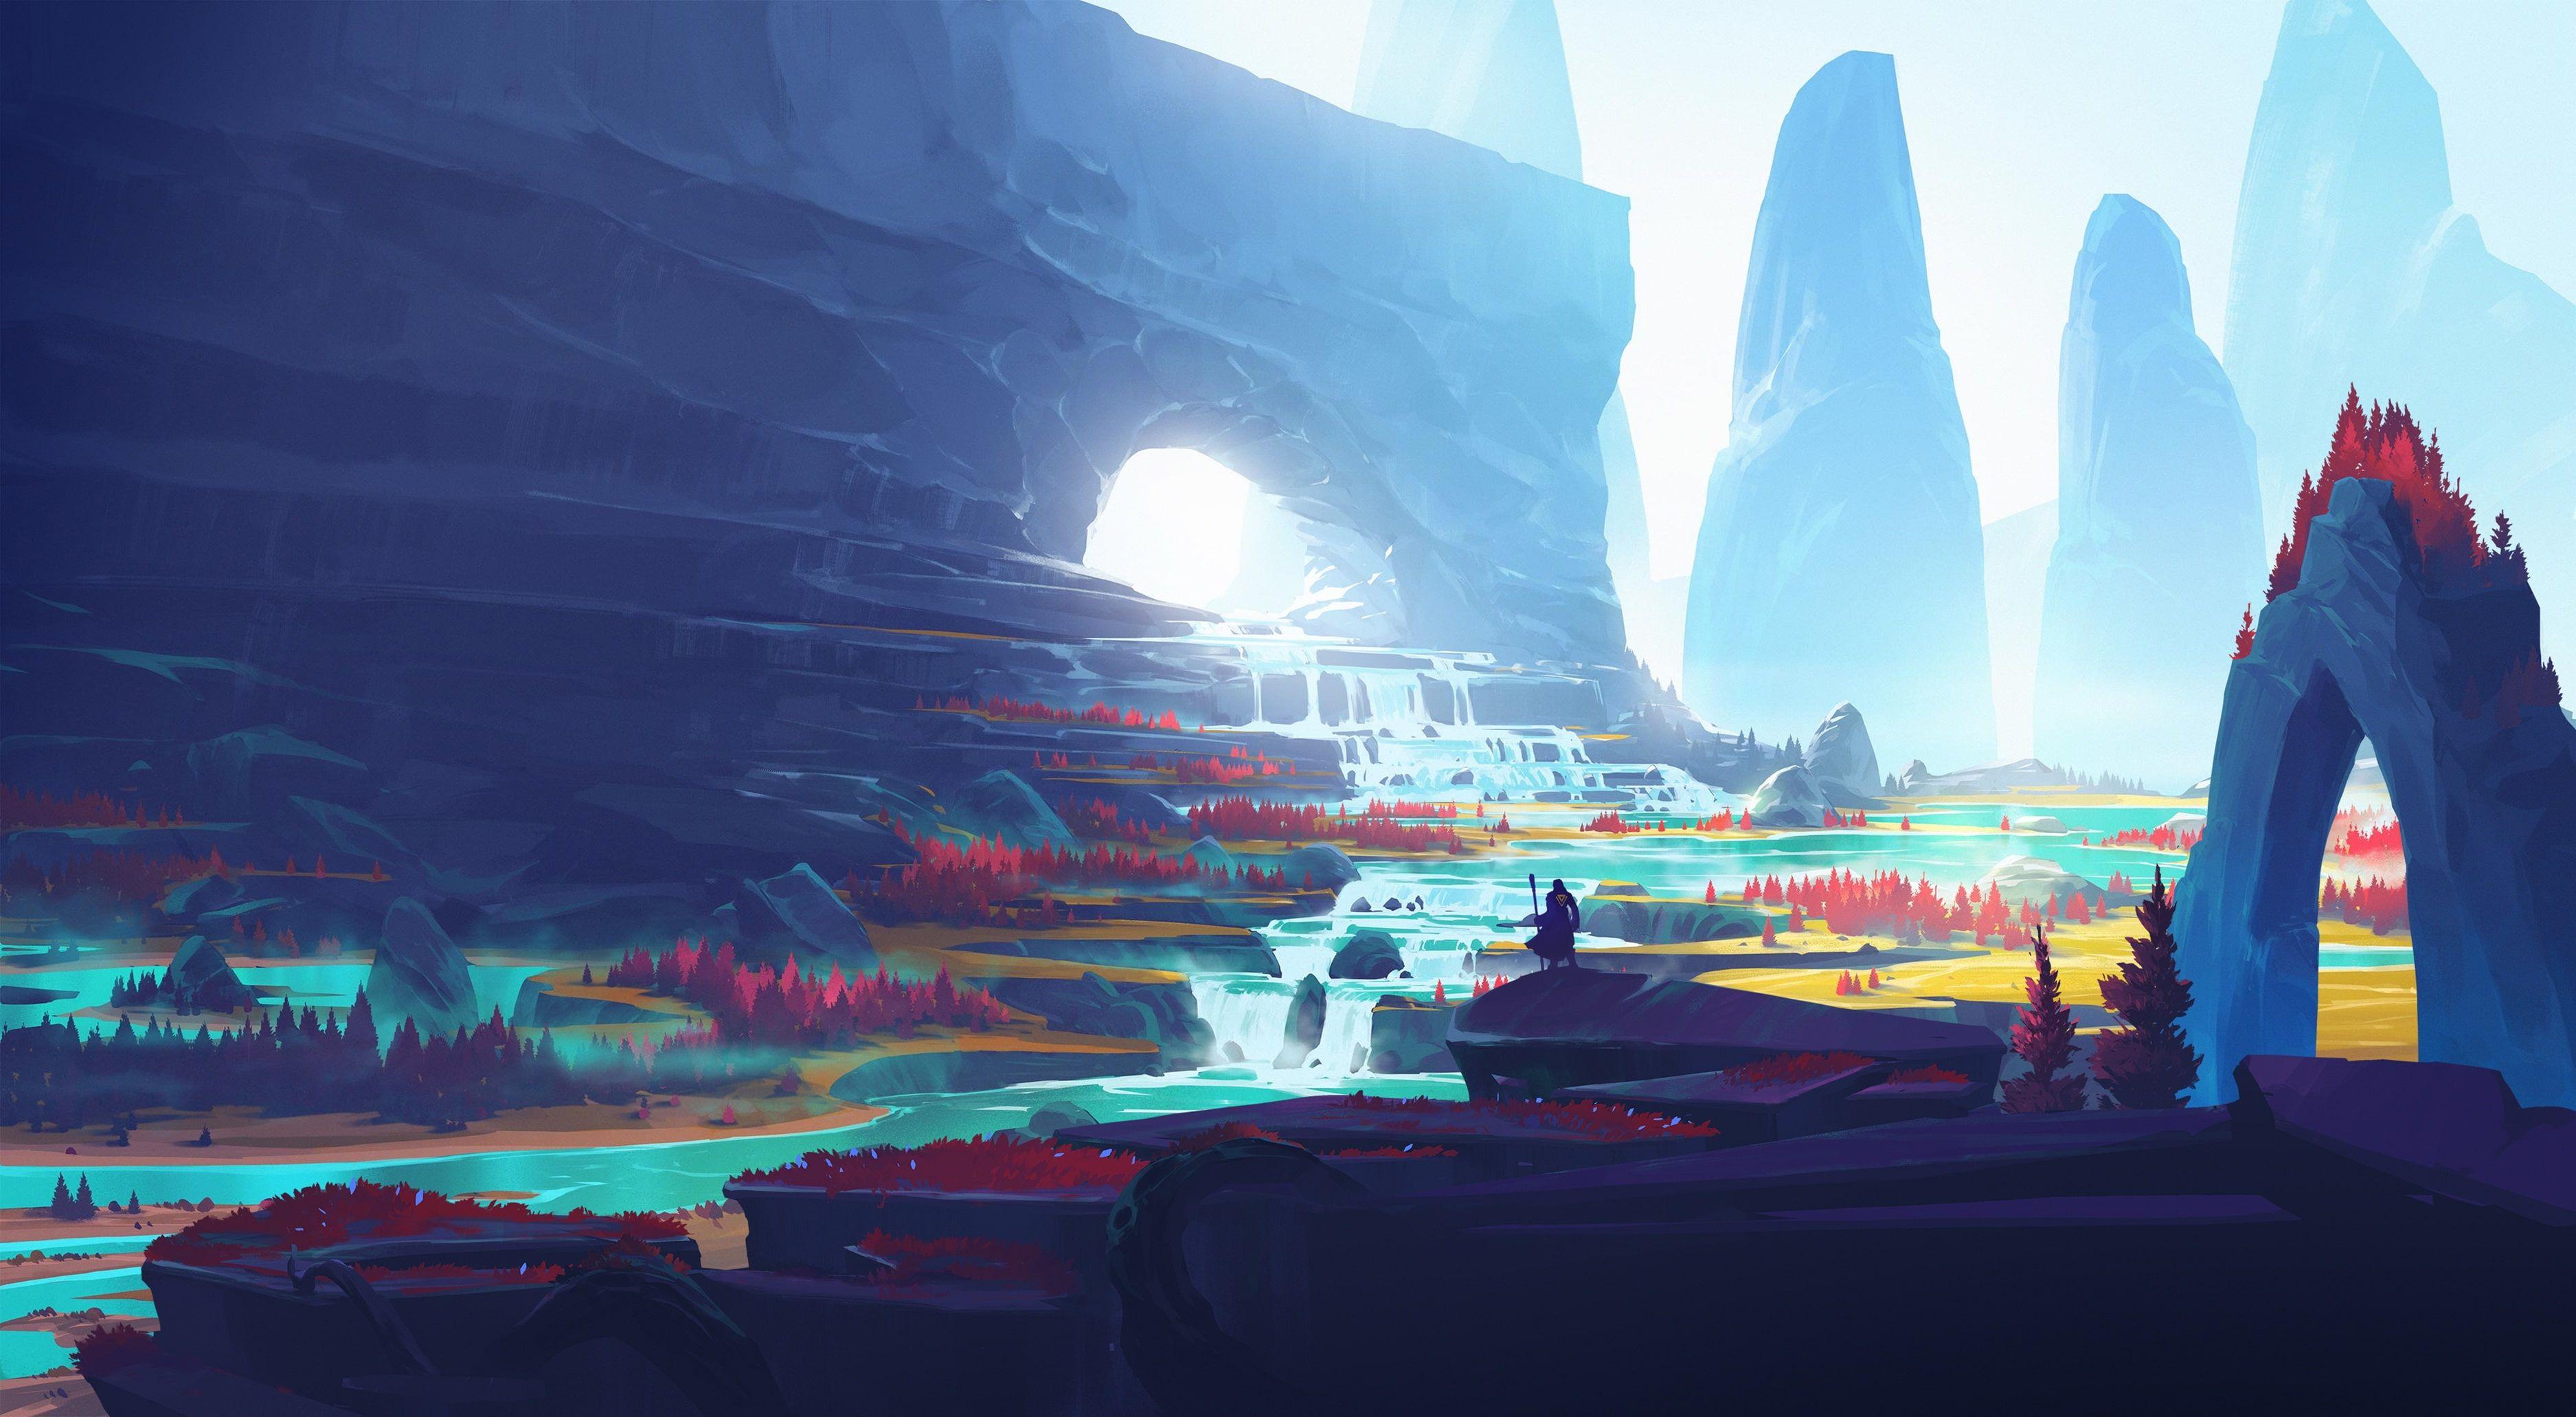 Digital Art Warrior Landscape Mountains Duelyst Video Games Illustration Artwork 2k Wallpaper Hdwallpaper Deskt In 2020 Landscape Wallpaper Desktop Wallpaper